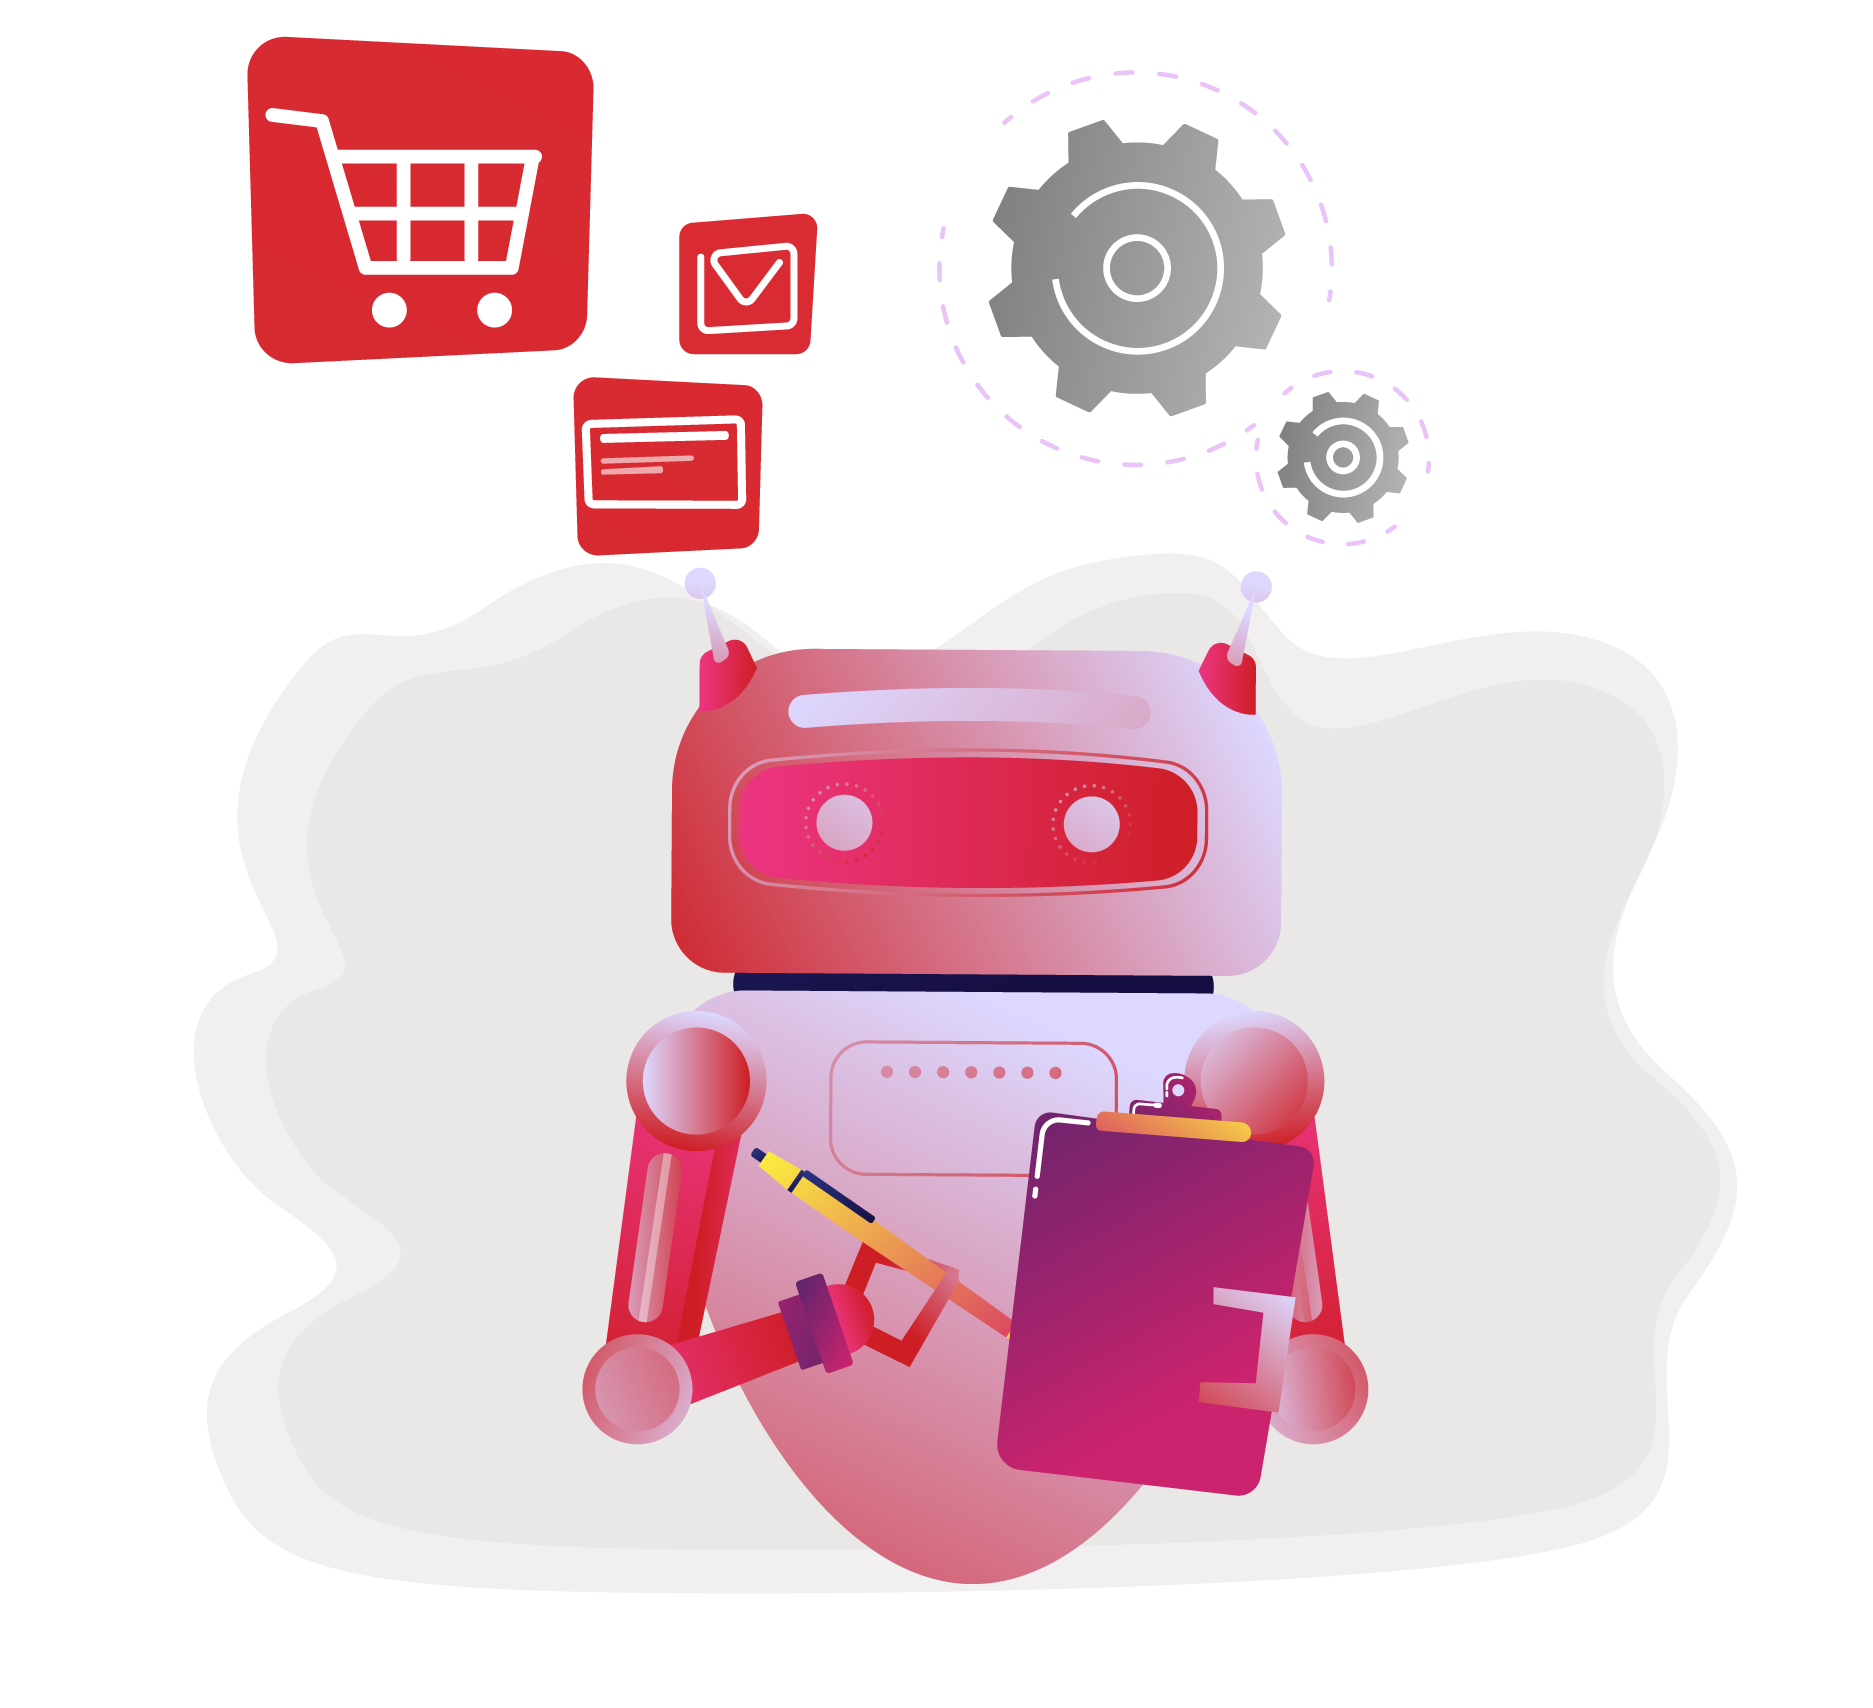 Boostrap-Ecommerce-Bitext-Machine-Learning-Chatbots